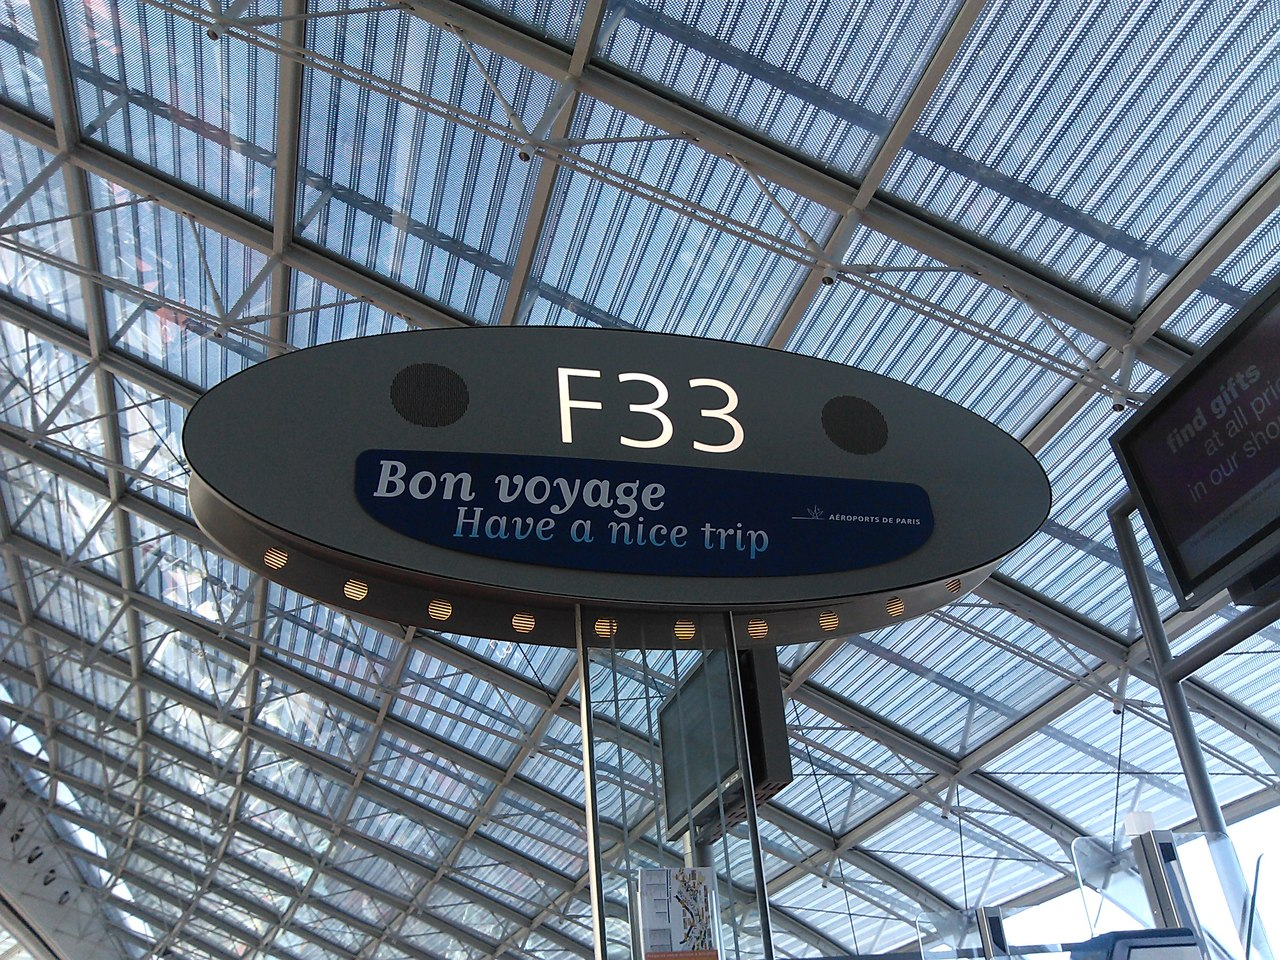 схема терминала 2e аэропорт шарль де голь